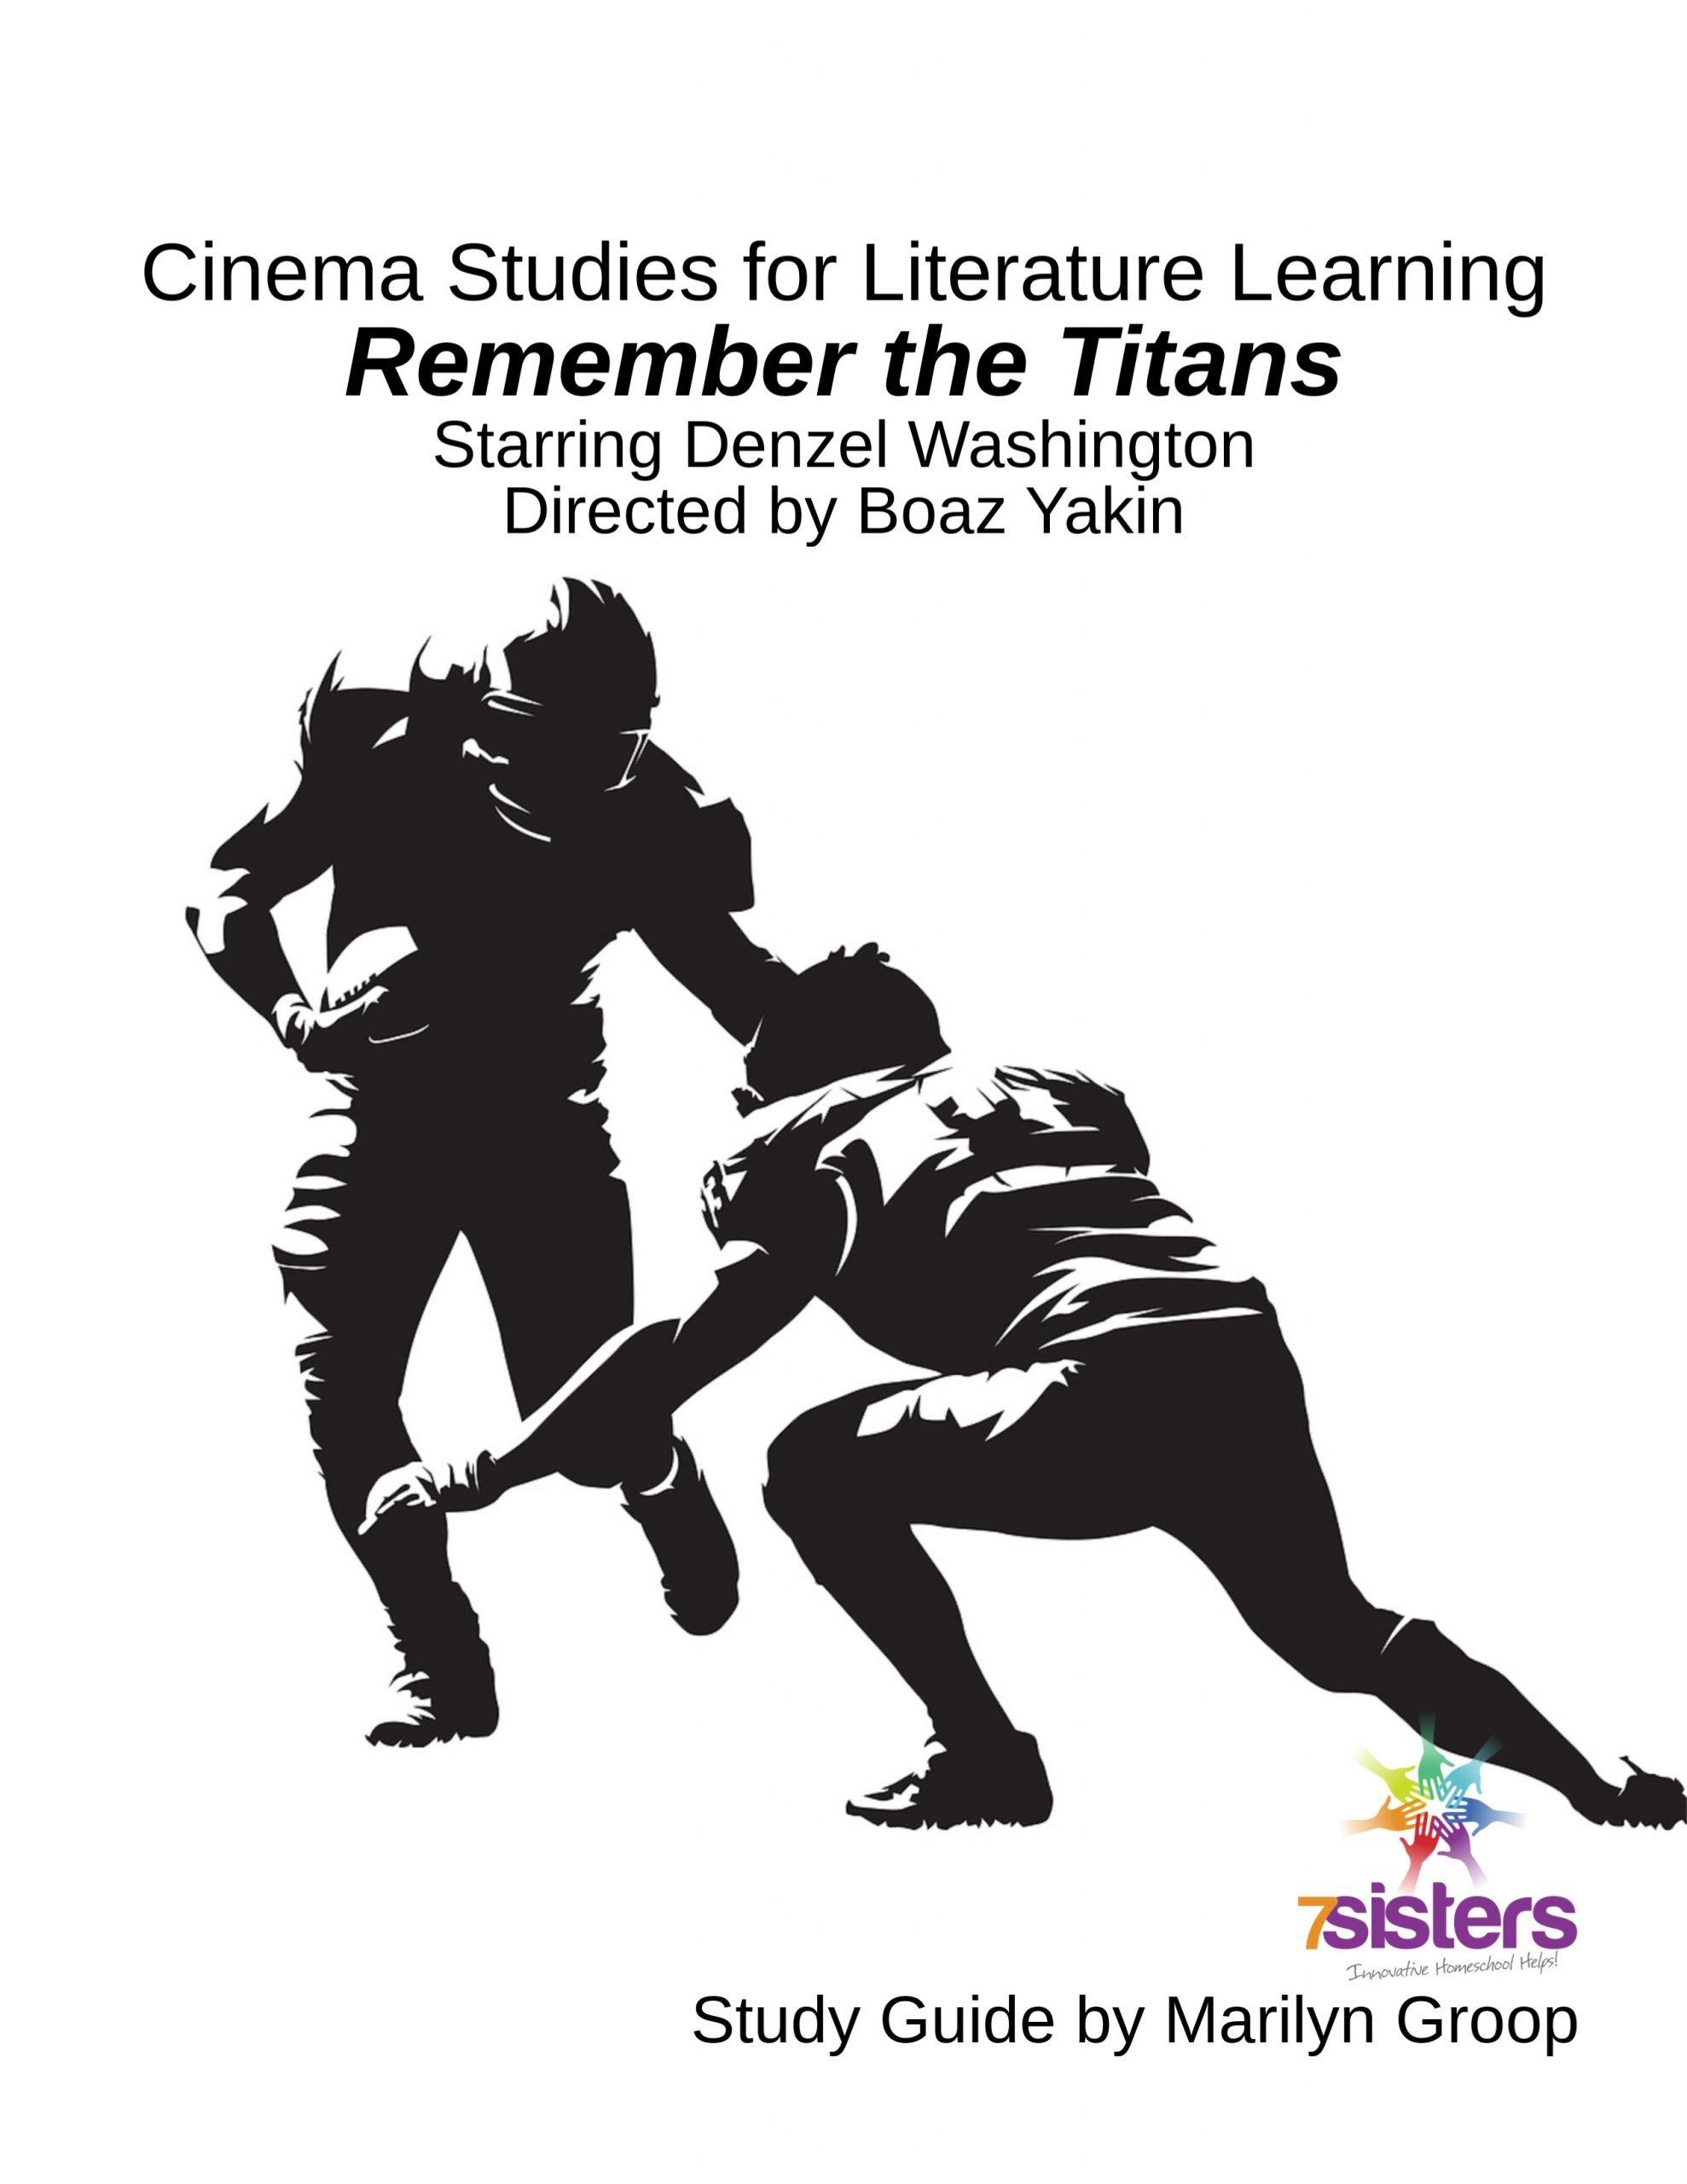 Remember The Titans Cinema Study Guide